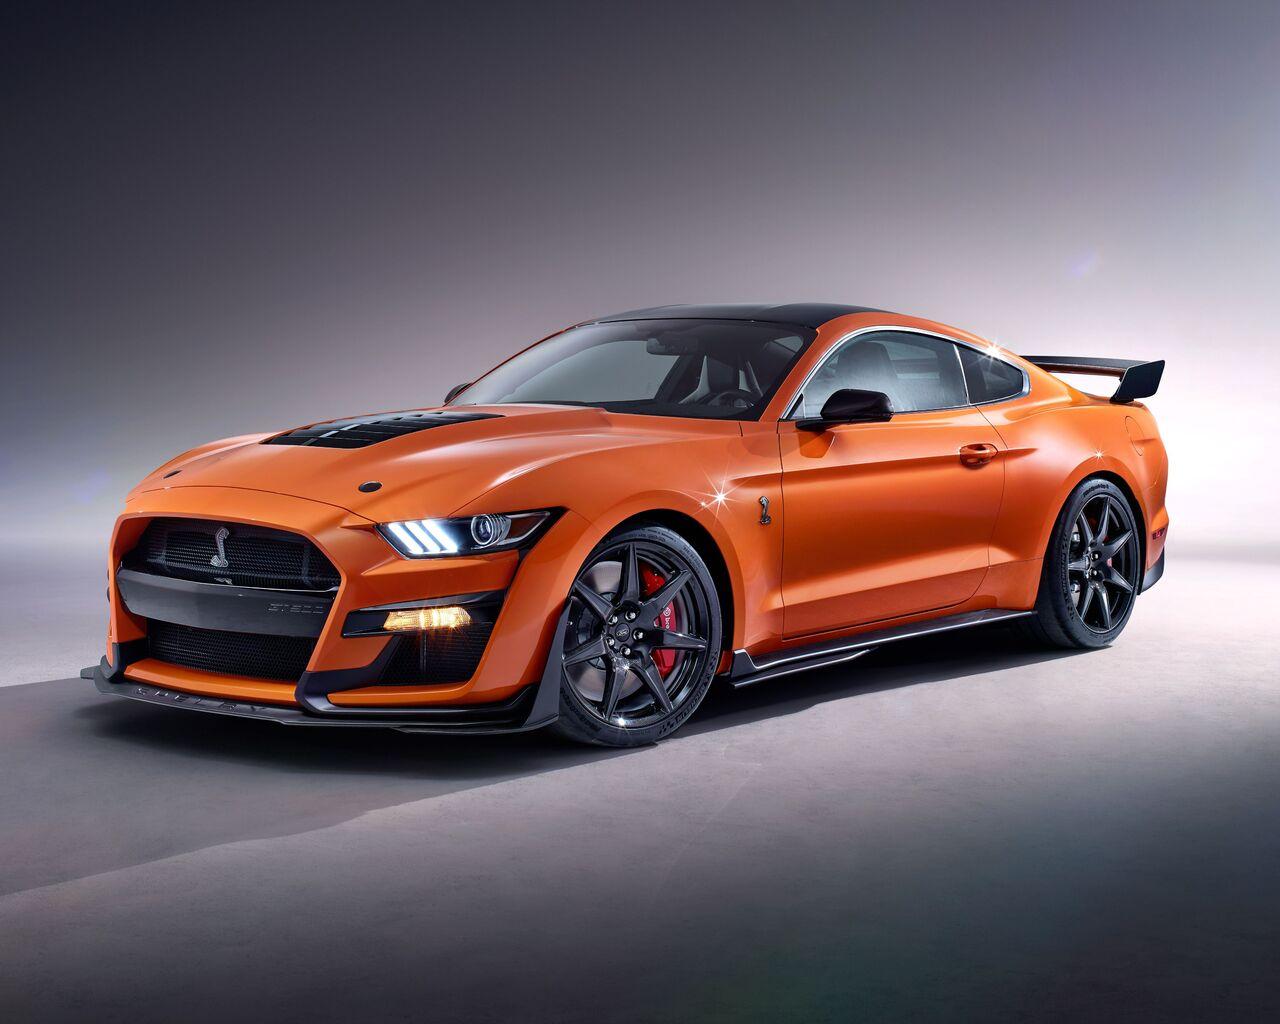 2020 Ford Mustang Gt Wallpaper